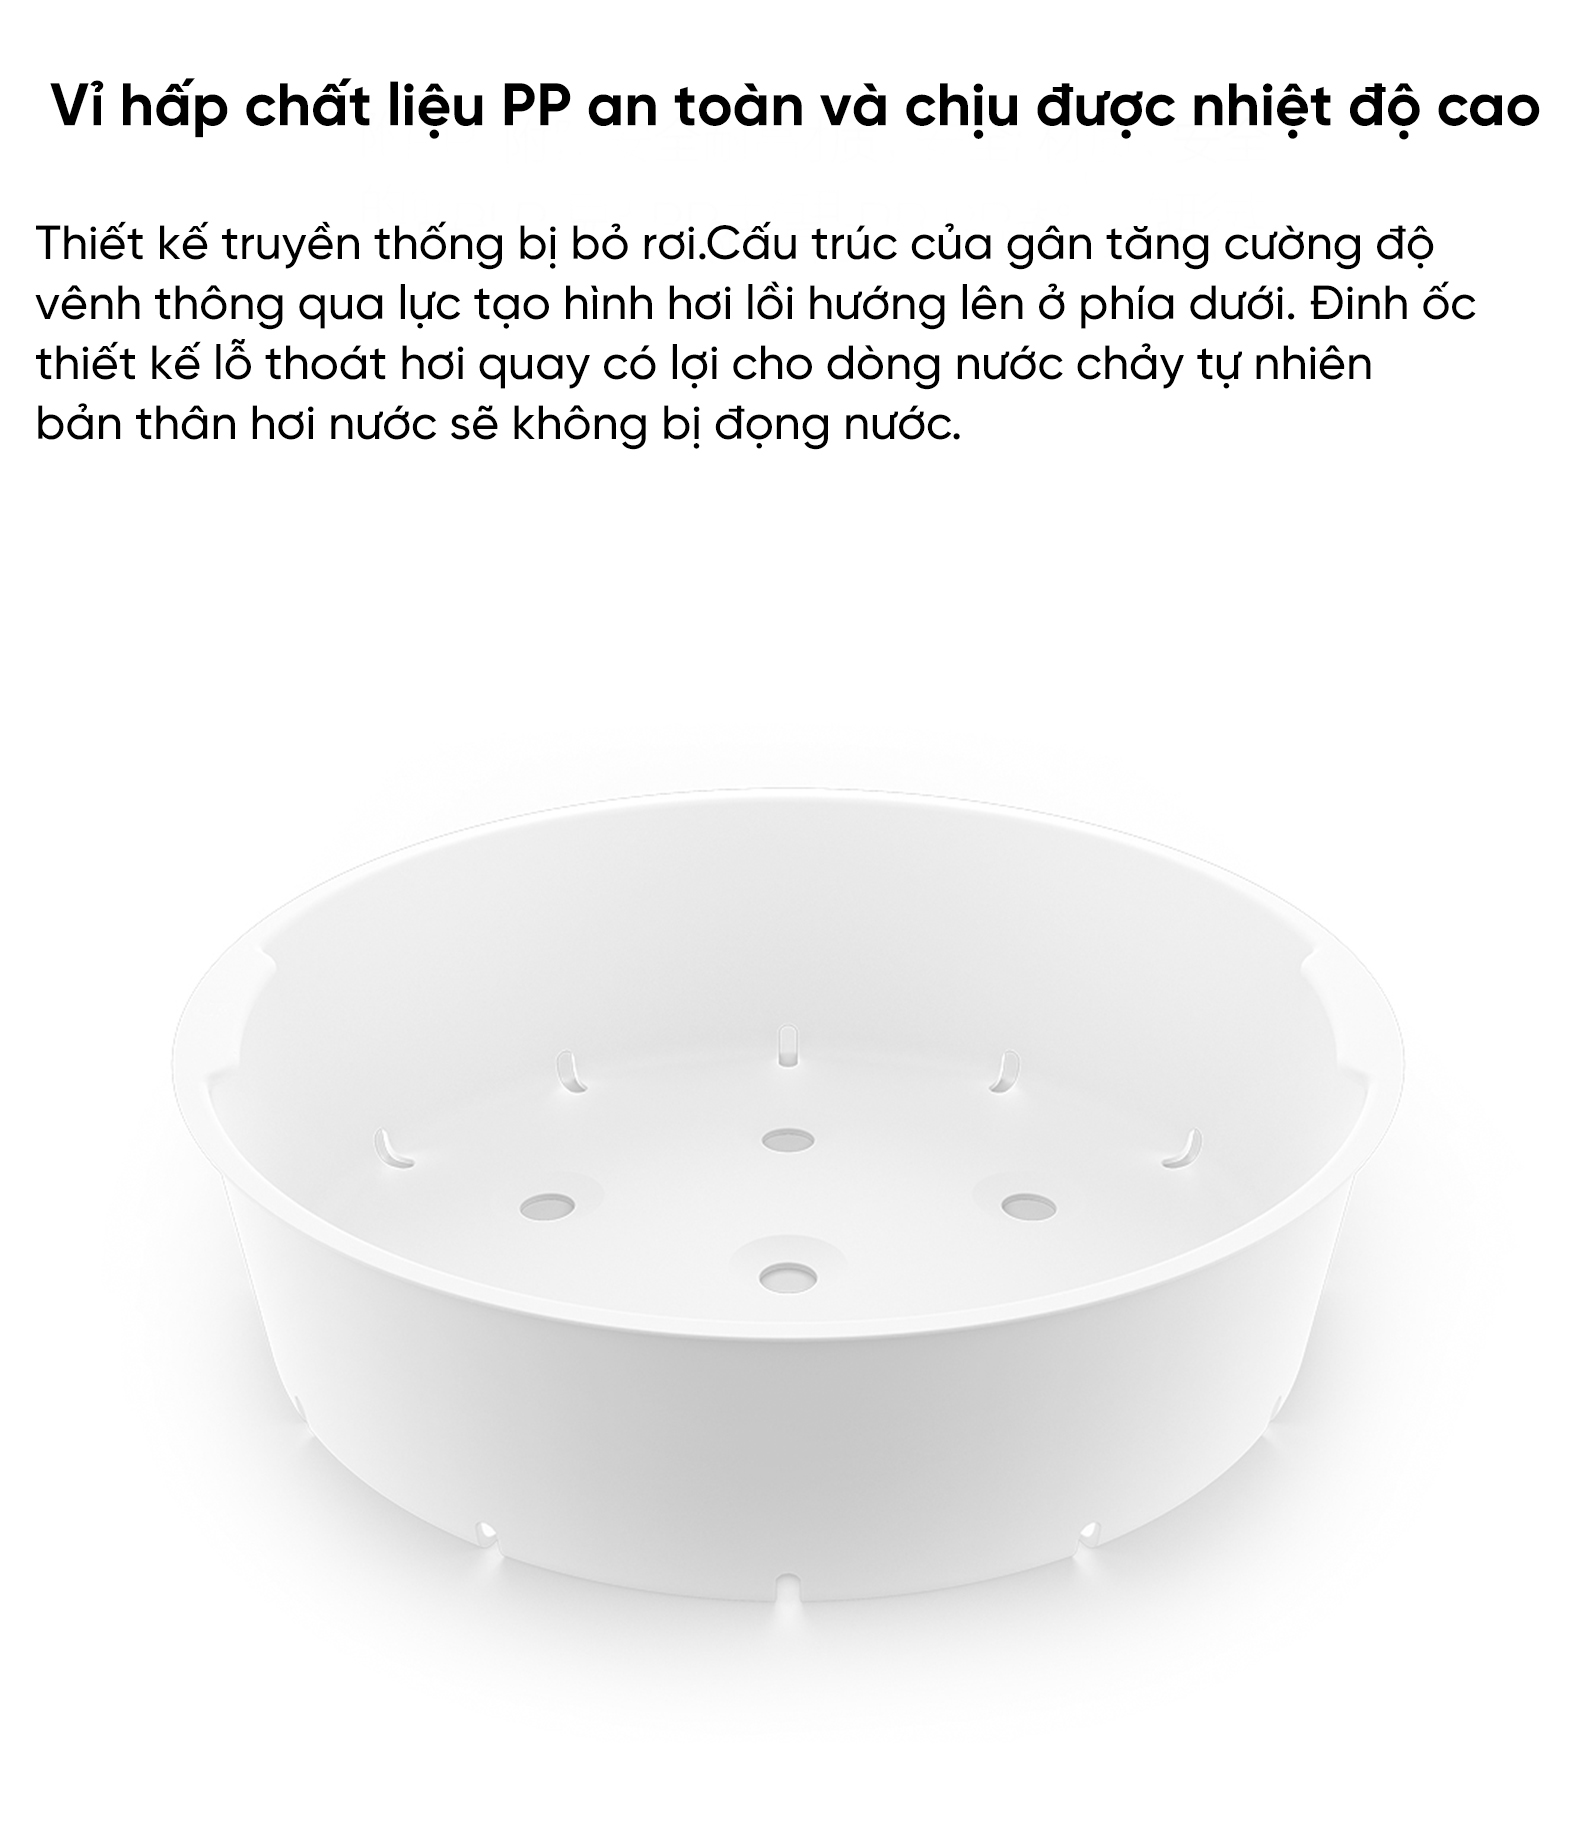 noi-com-dien-cao-tan-thong-minh-xiaomi-4l-IHFB02CM-24